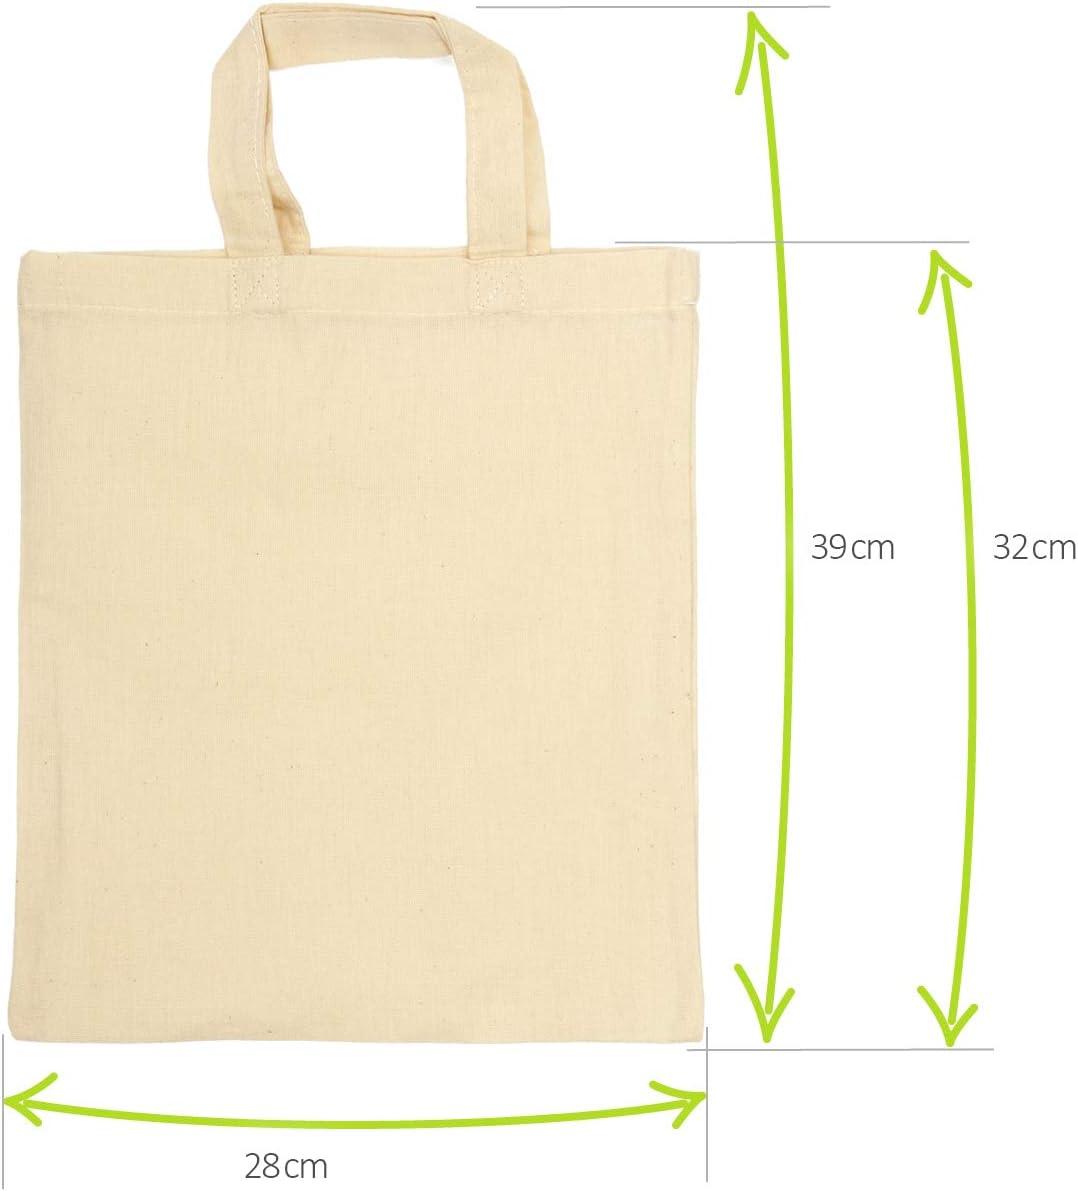 sin impresi/ón 12 Piezas - 22x26cm Oeko-Tex/® Standard 100 com-four/® 12x Bolsa de algod/ón Bolsa de Transporte Reutilizable Ideal para Pintar